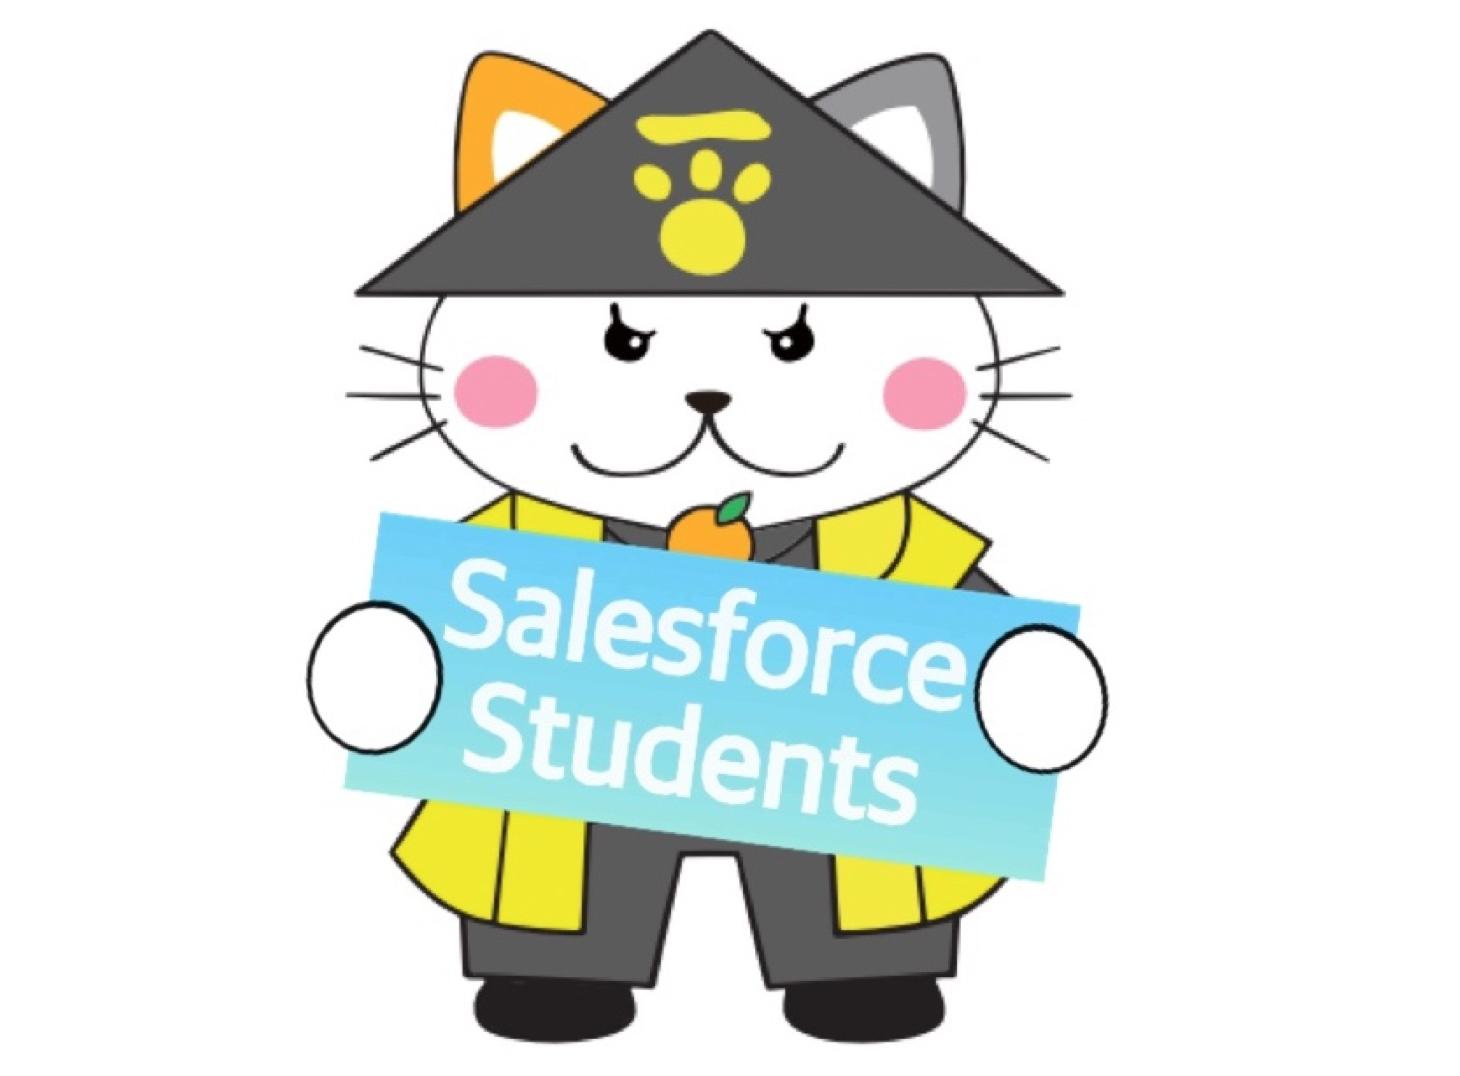 【Online】萩Salesforce Students#9 「基礎」から学ぶフロー第3回